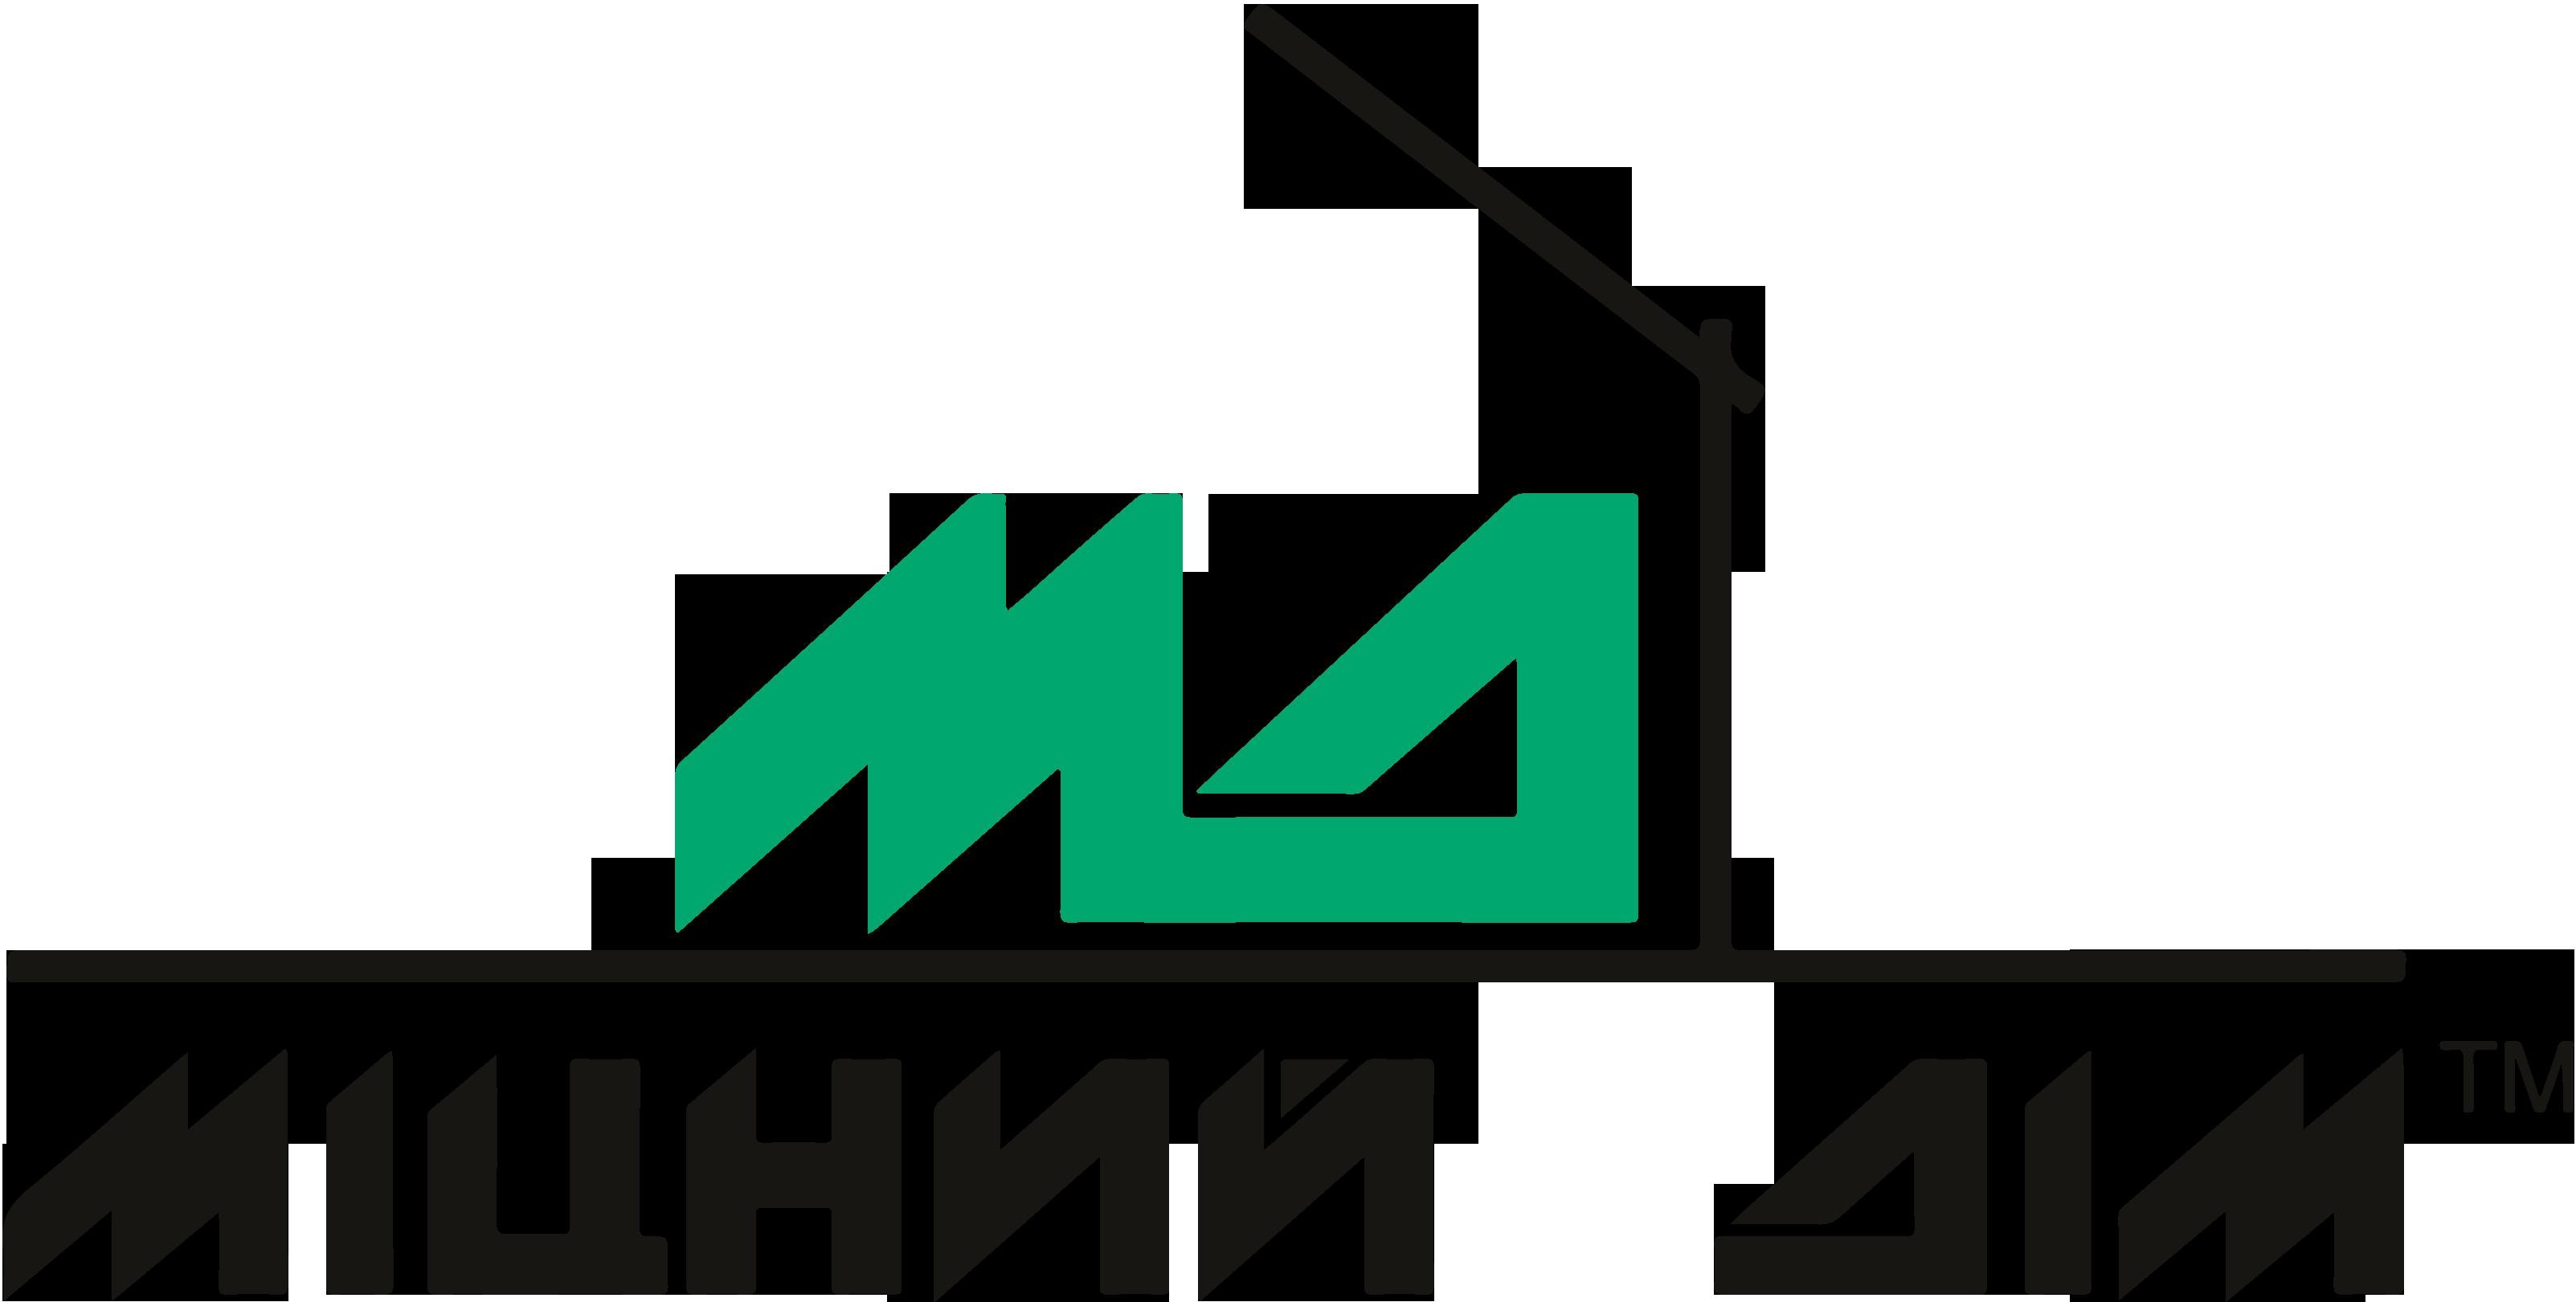 Интернет-магазин стройматериалов МДИМ